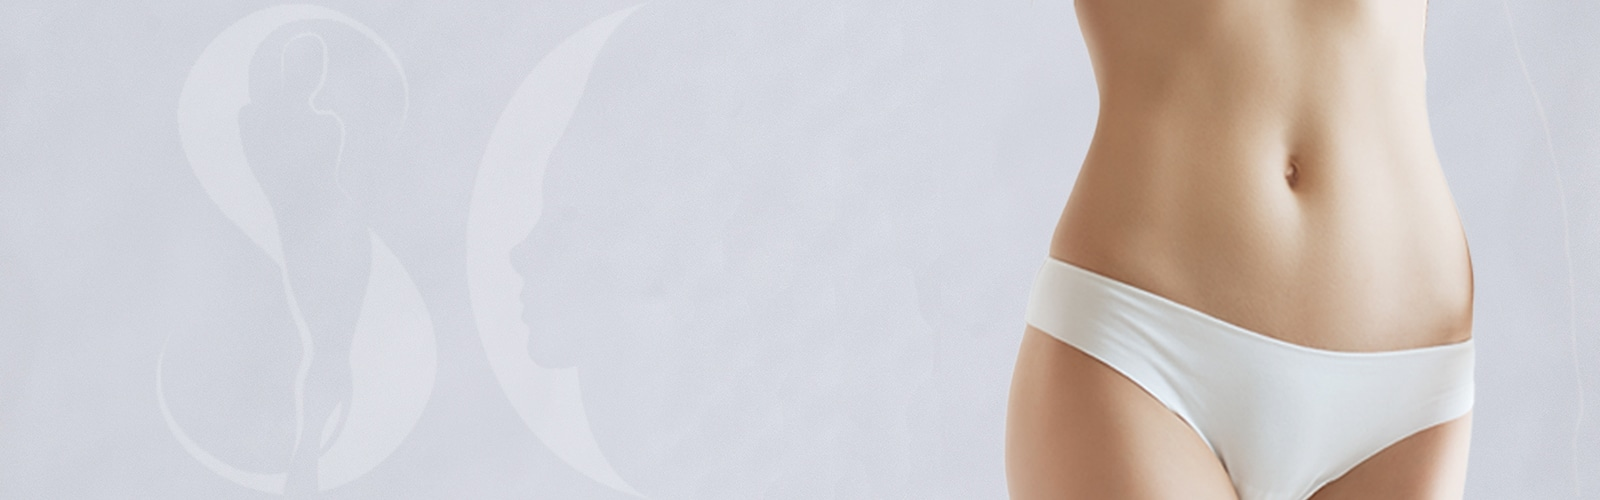 Abdominoplastie pour le ventre